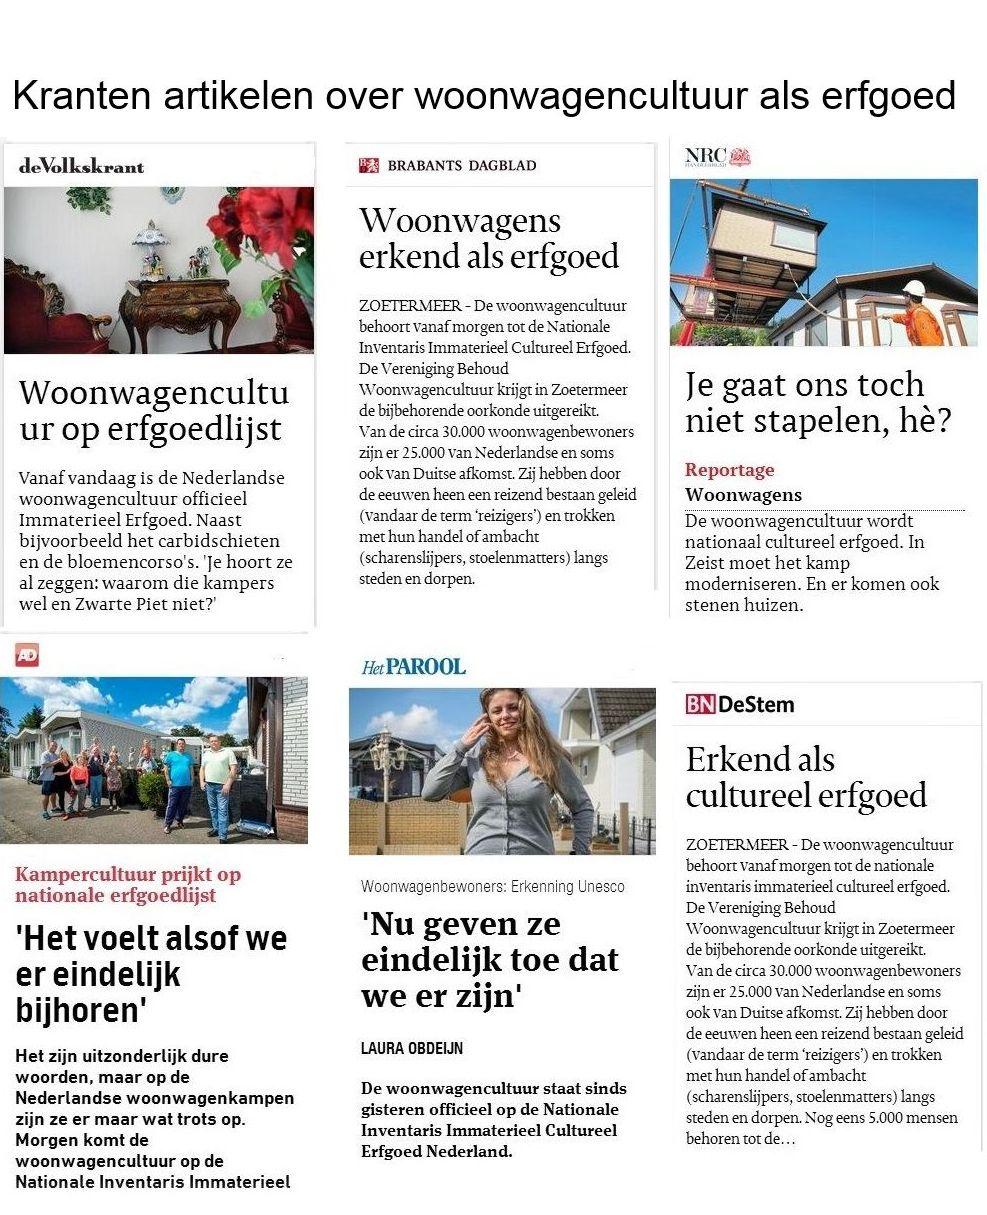 Woonwagencultuur_in_de_krant